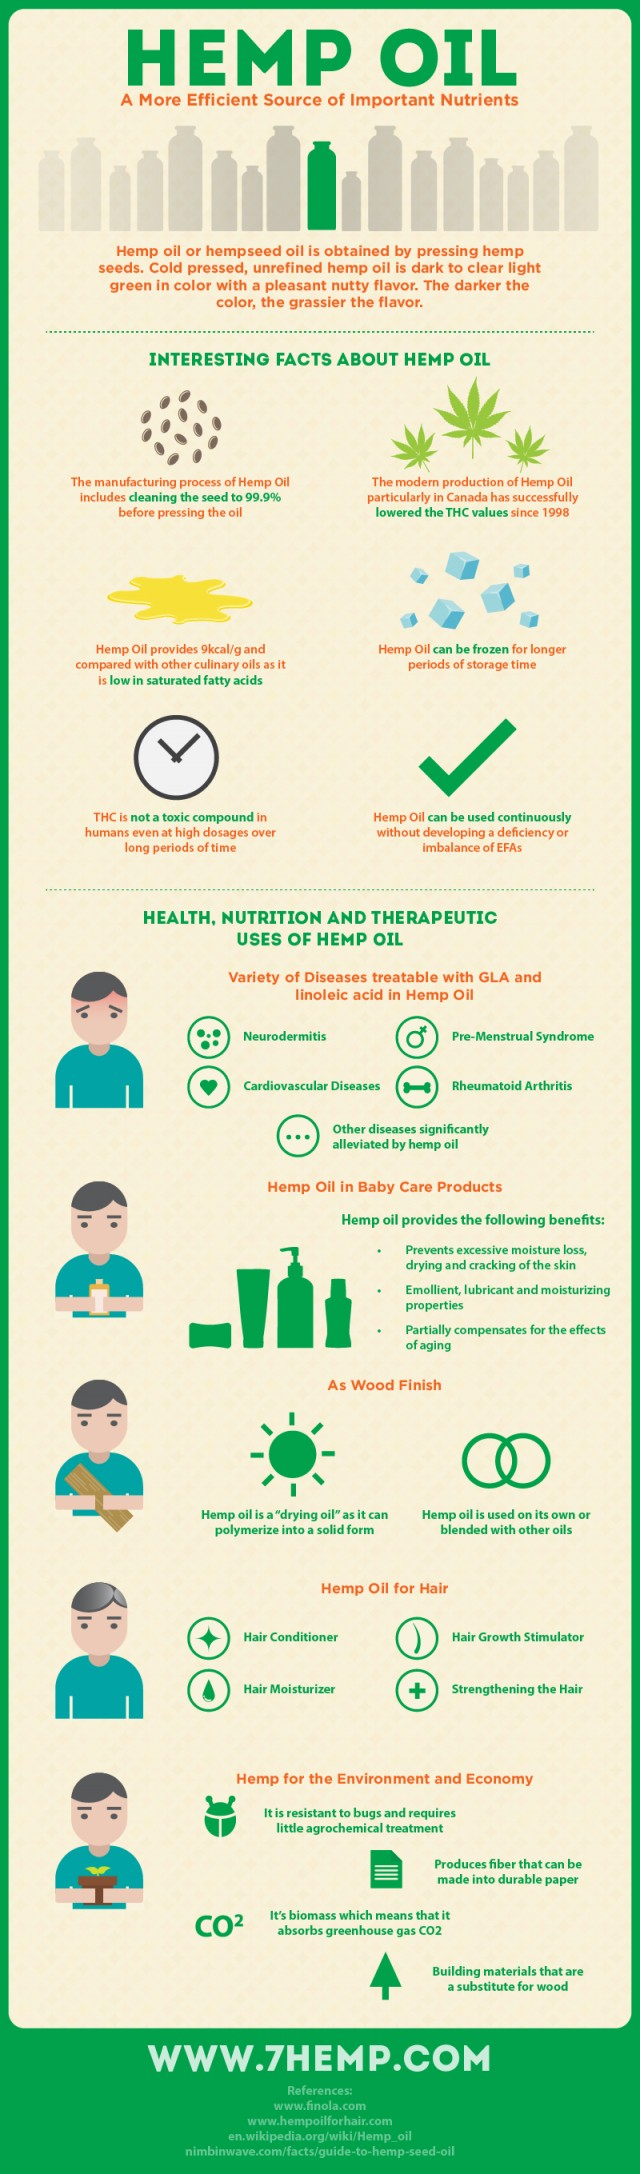 Hemp Oil Benefits Infographic